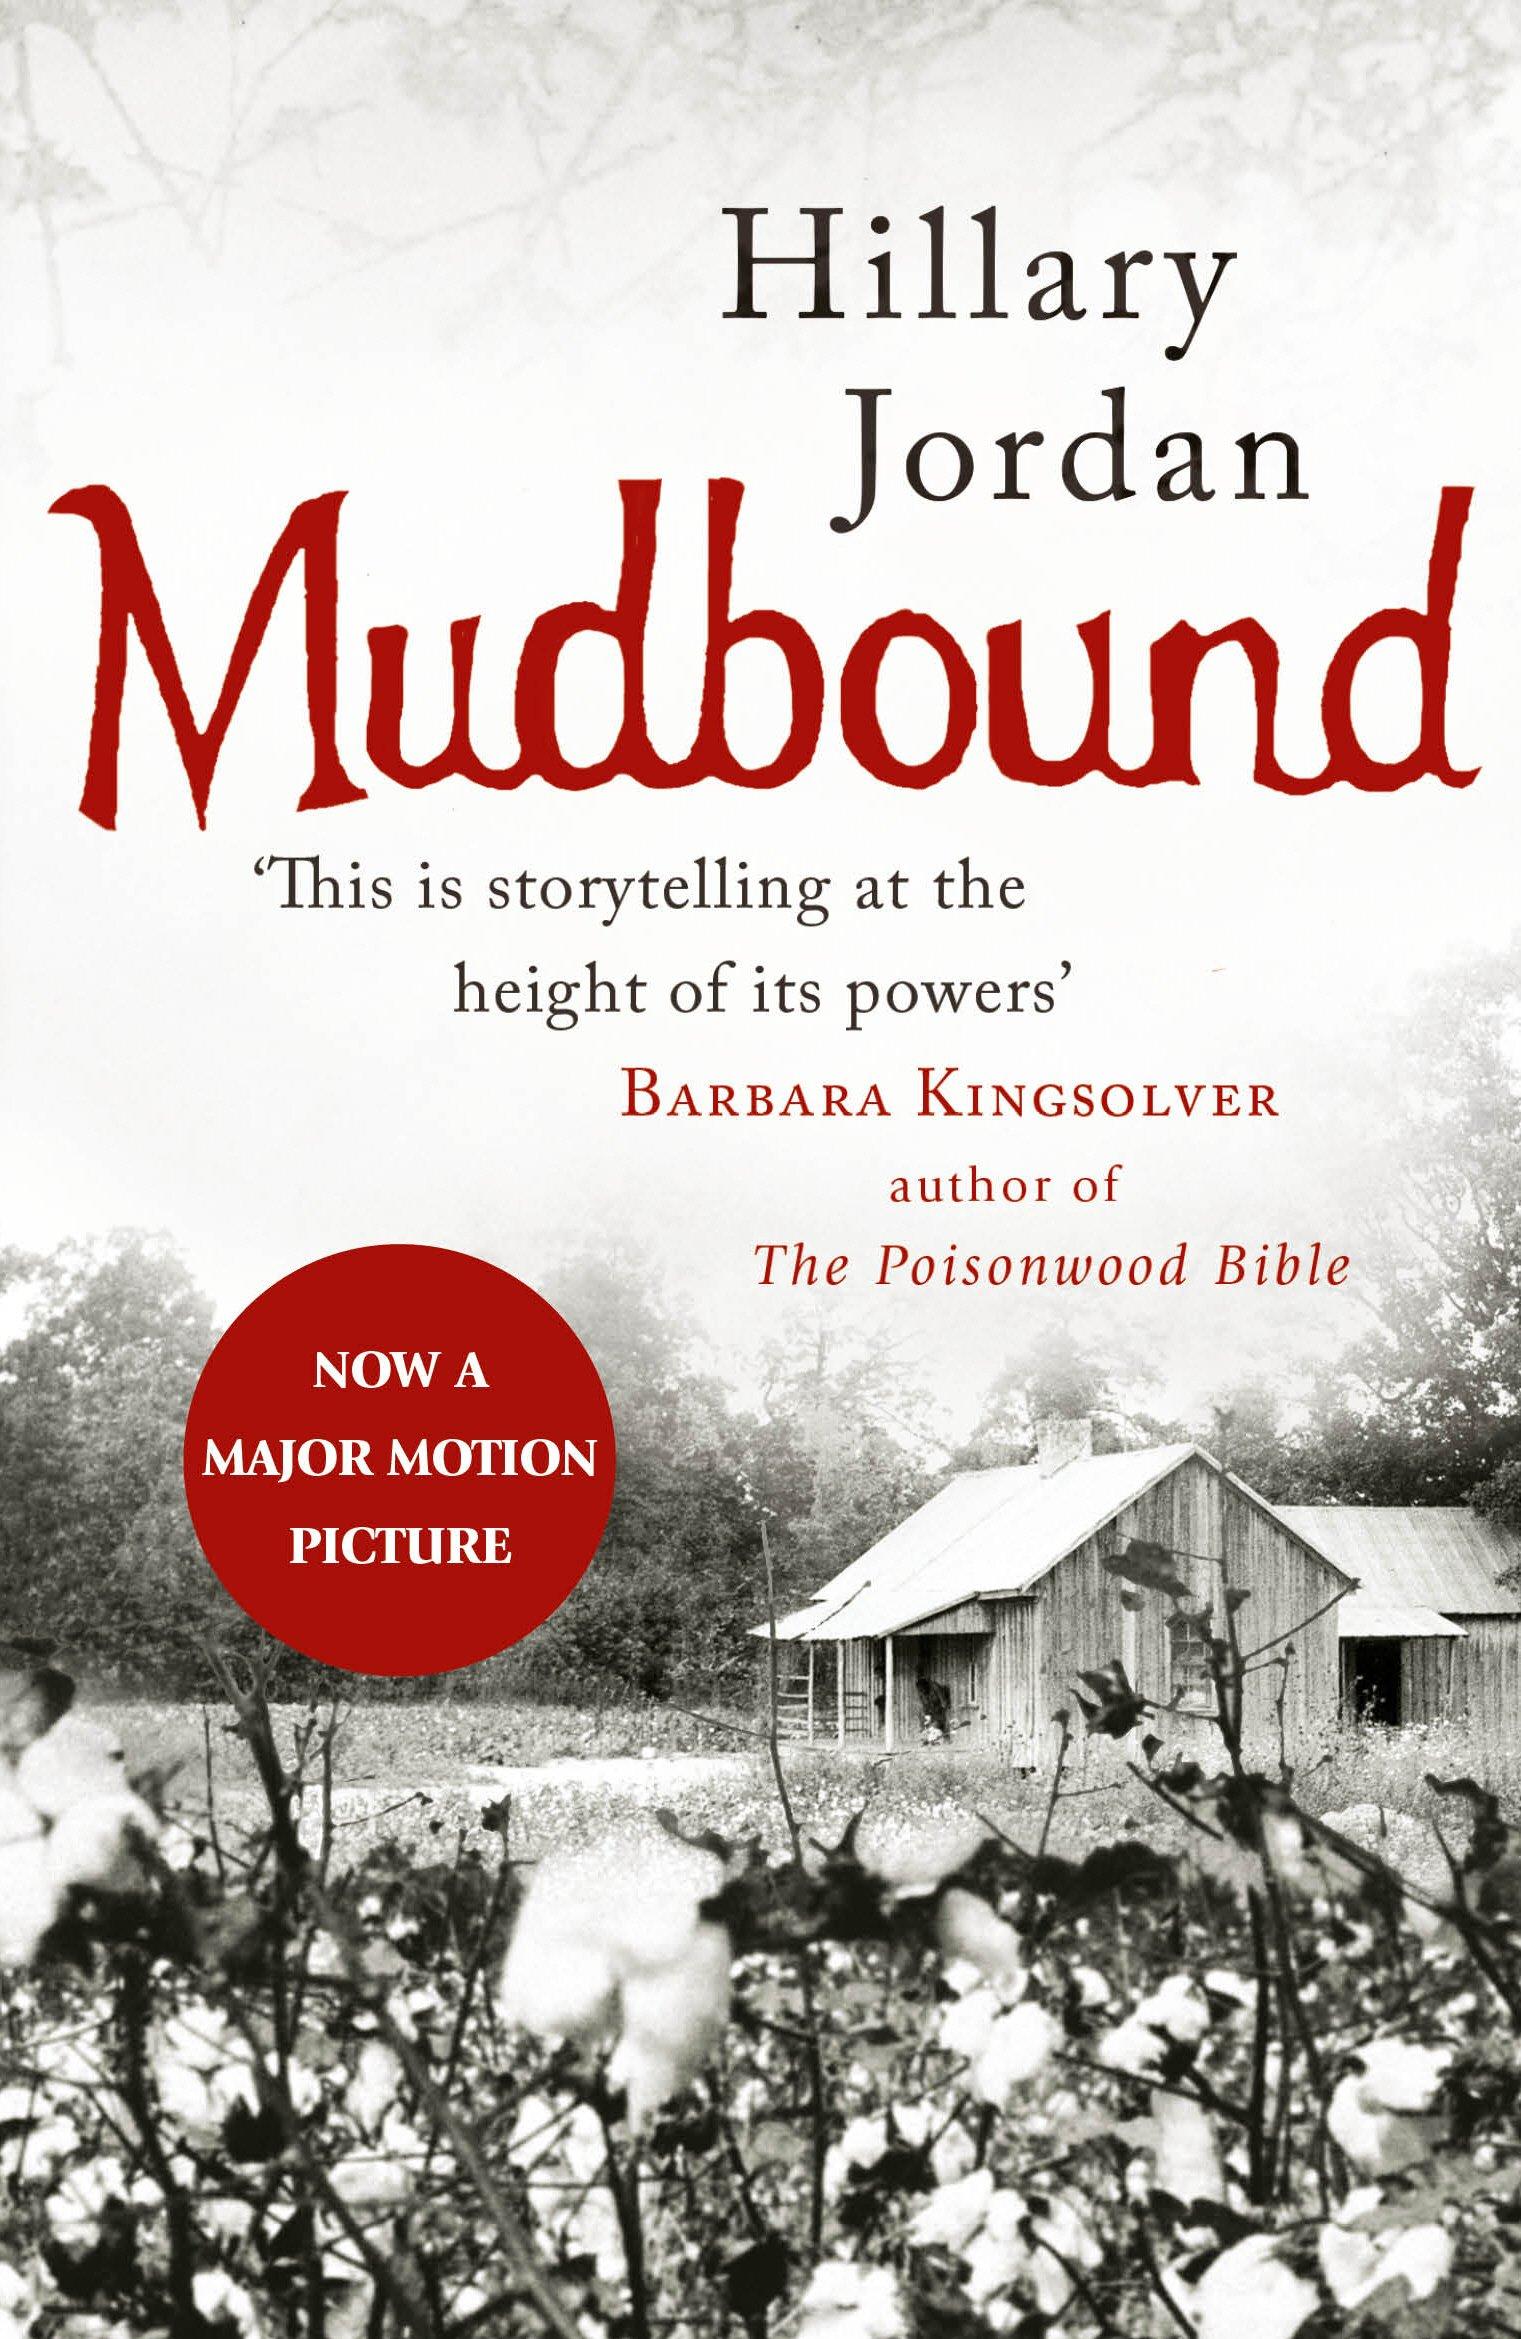 motor celebrar Controversia  Mudbound: Amazon.co.uk: Jordan, Hillary: 8601404815065: Books